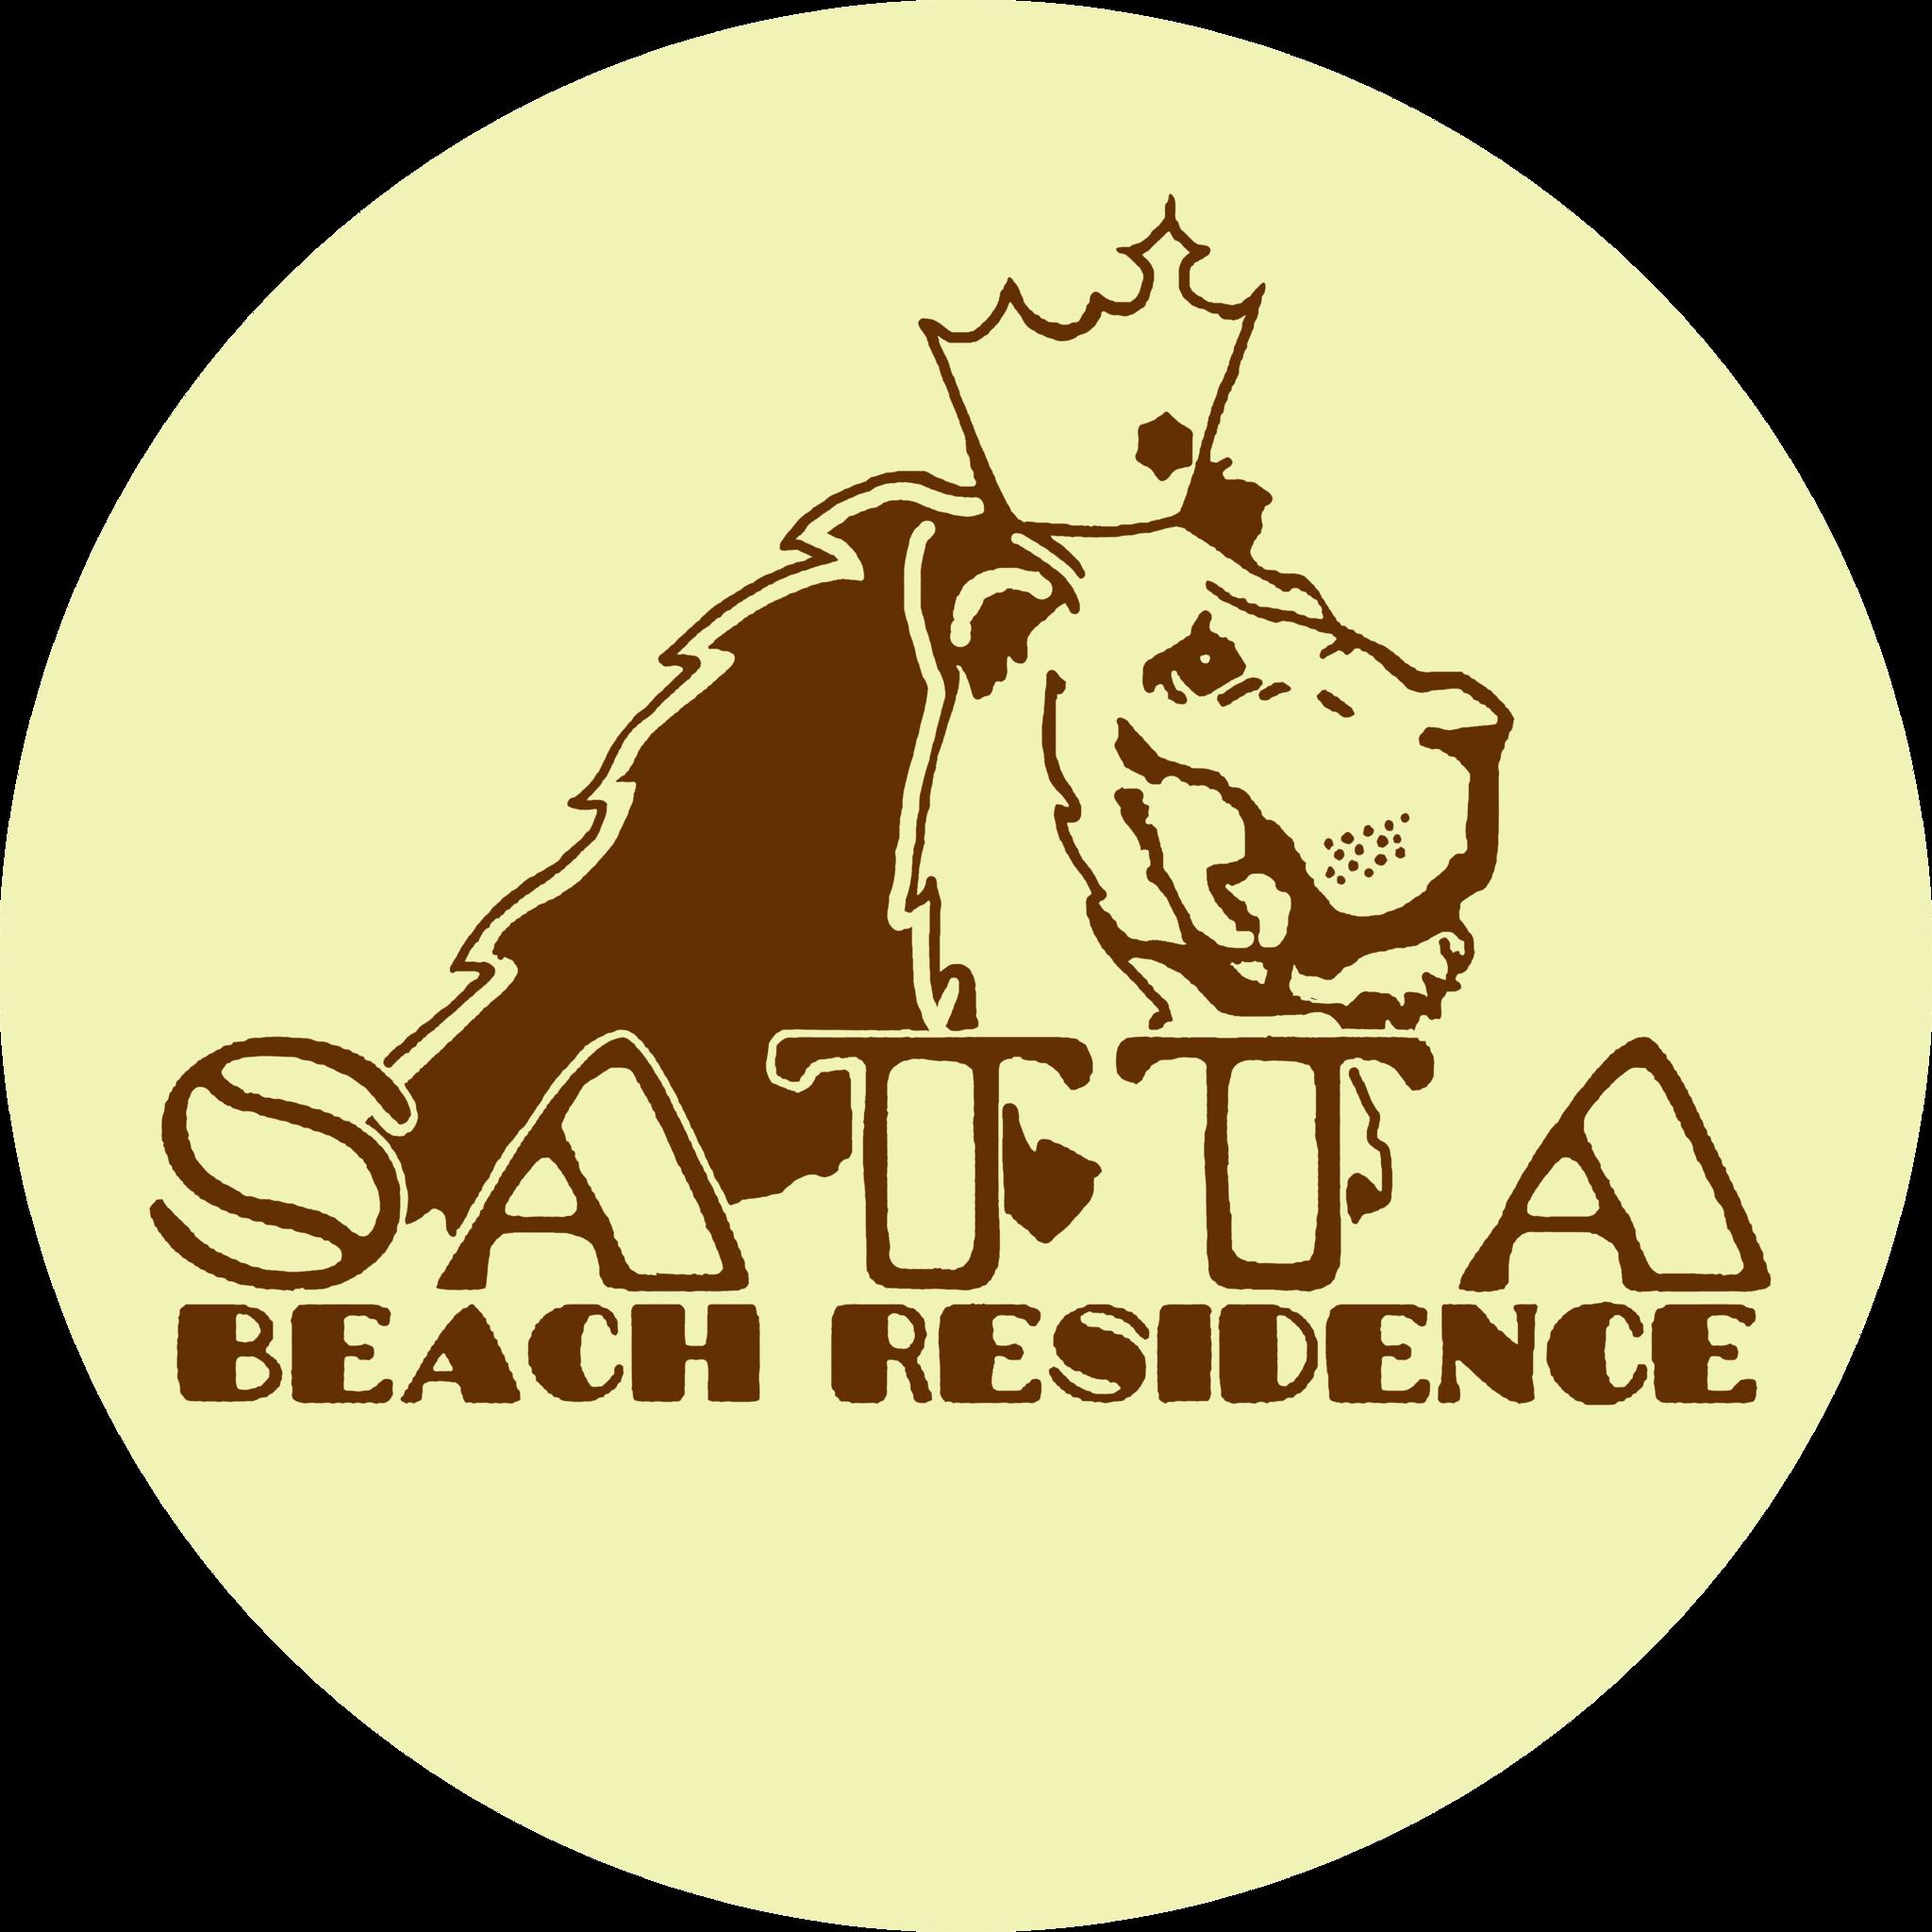 Satta Beach Residence